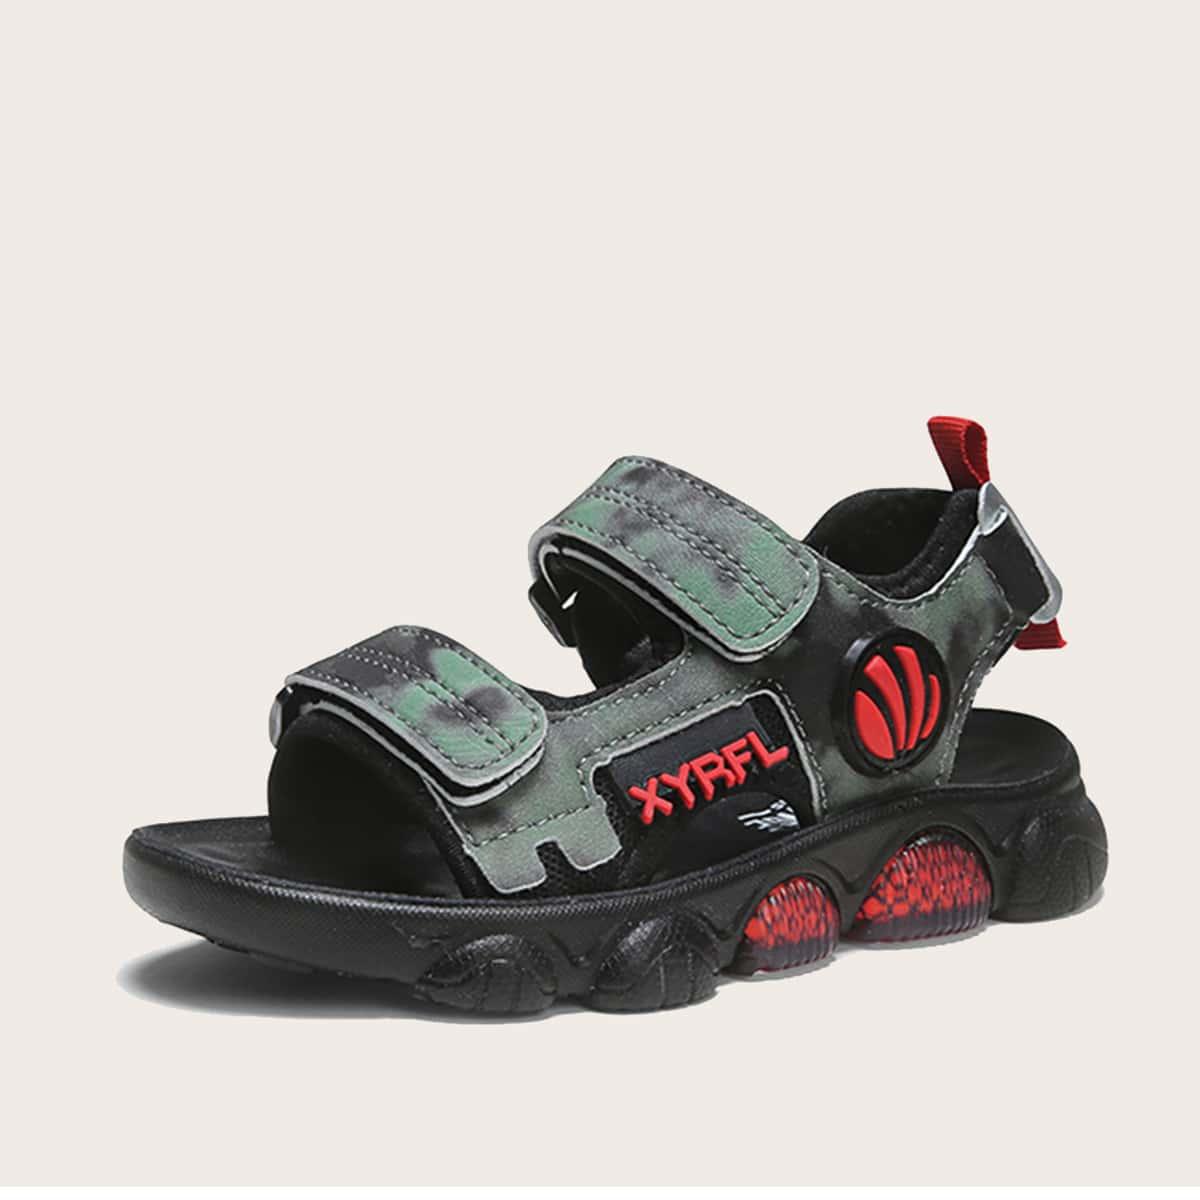 Буква детские сандалии